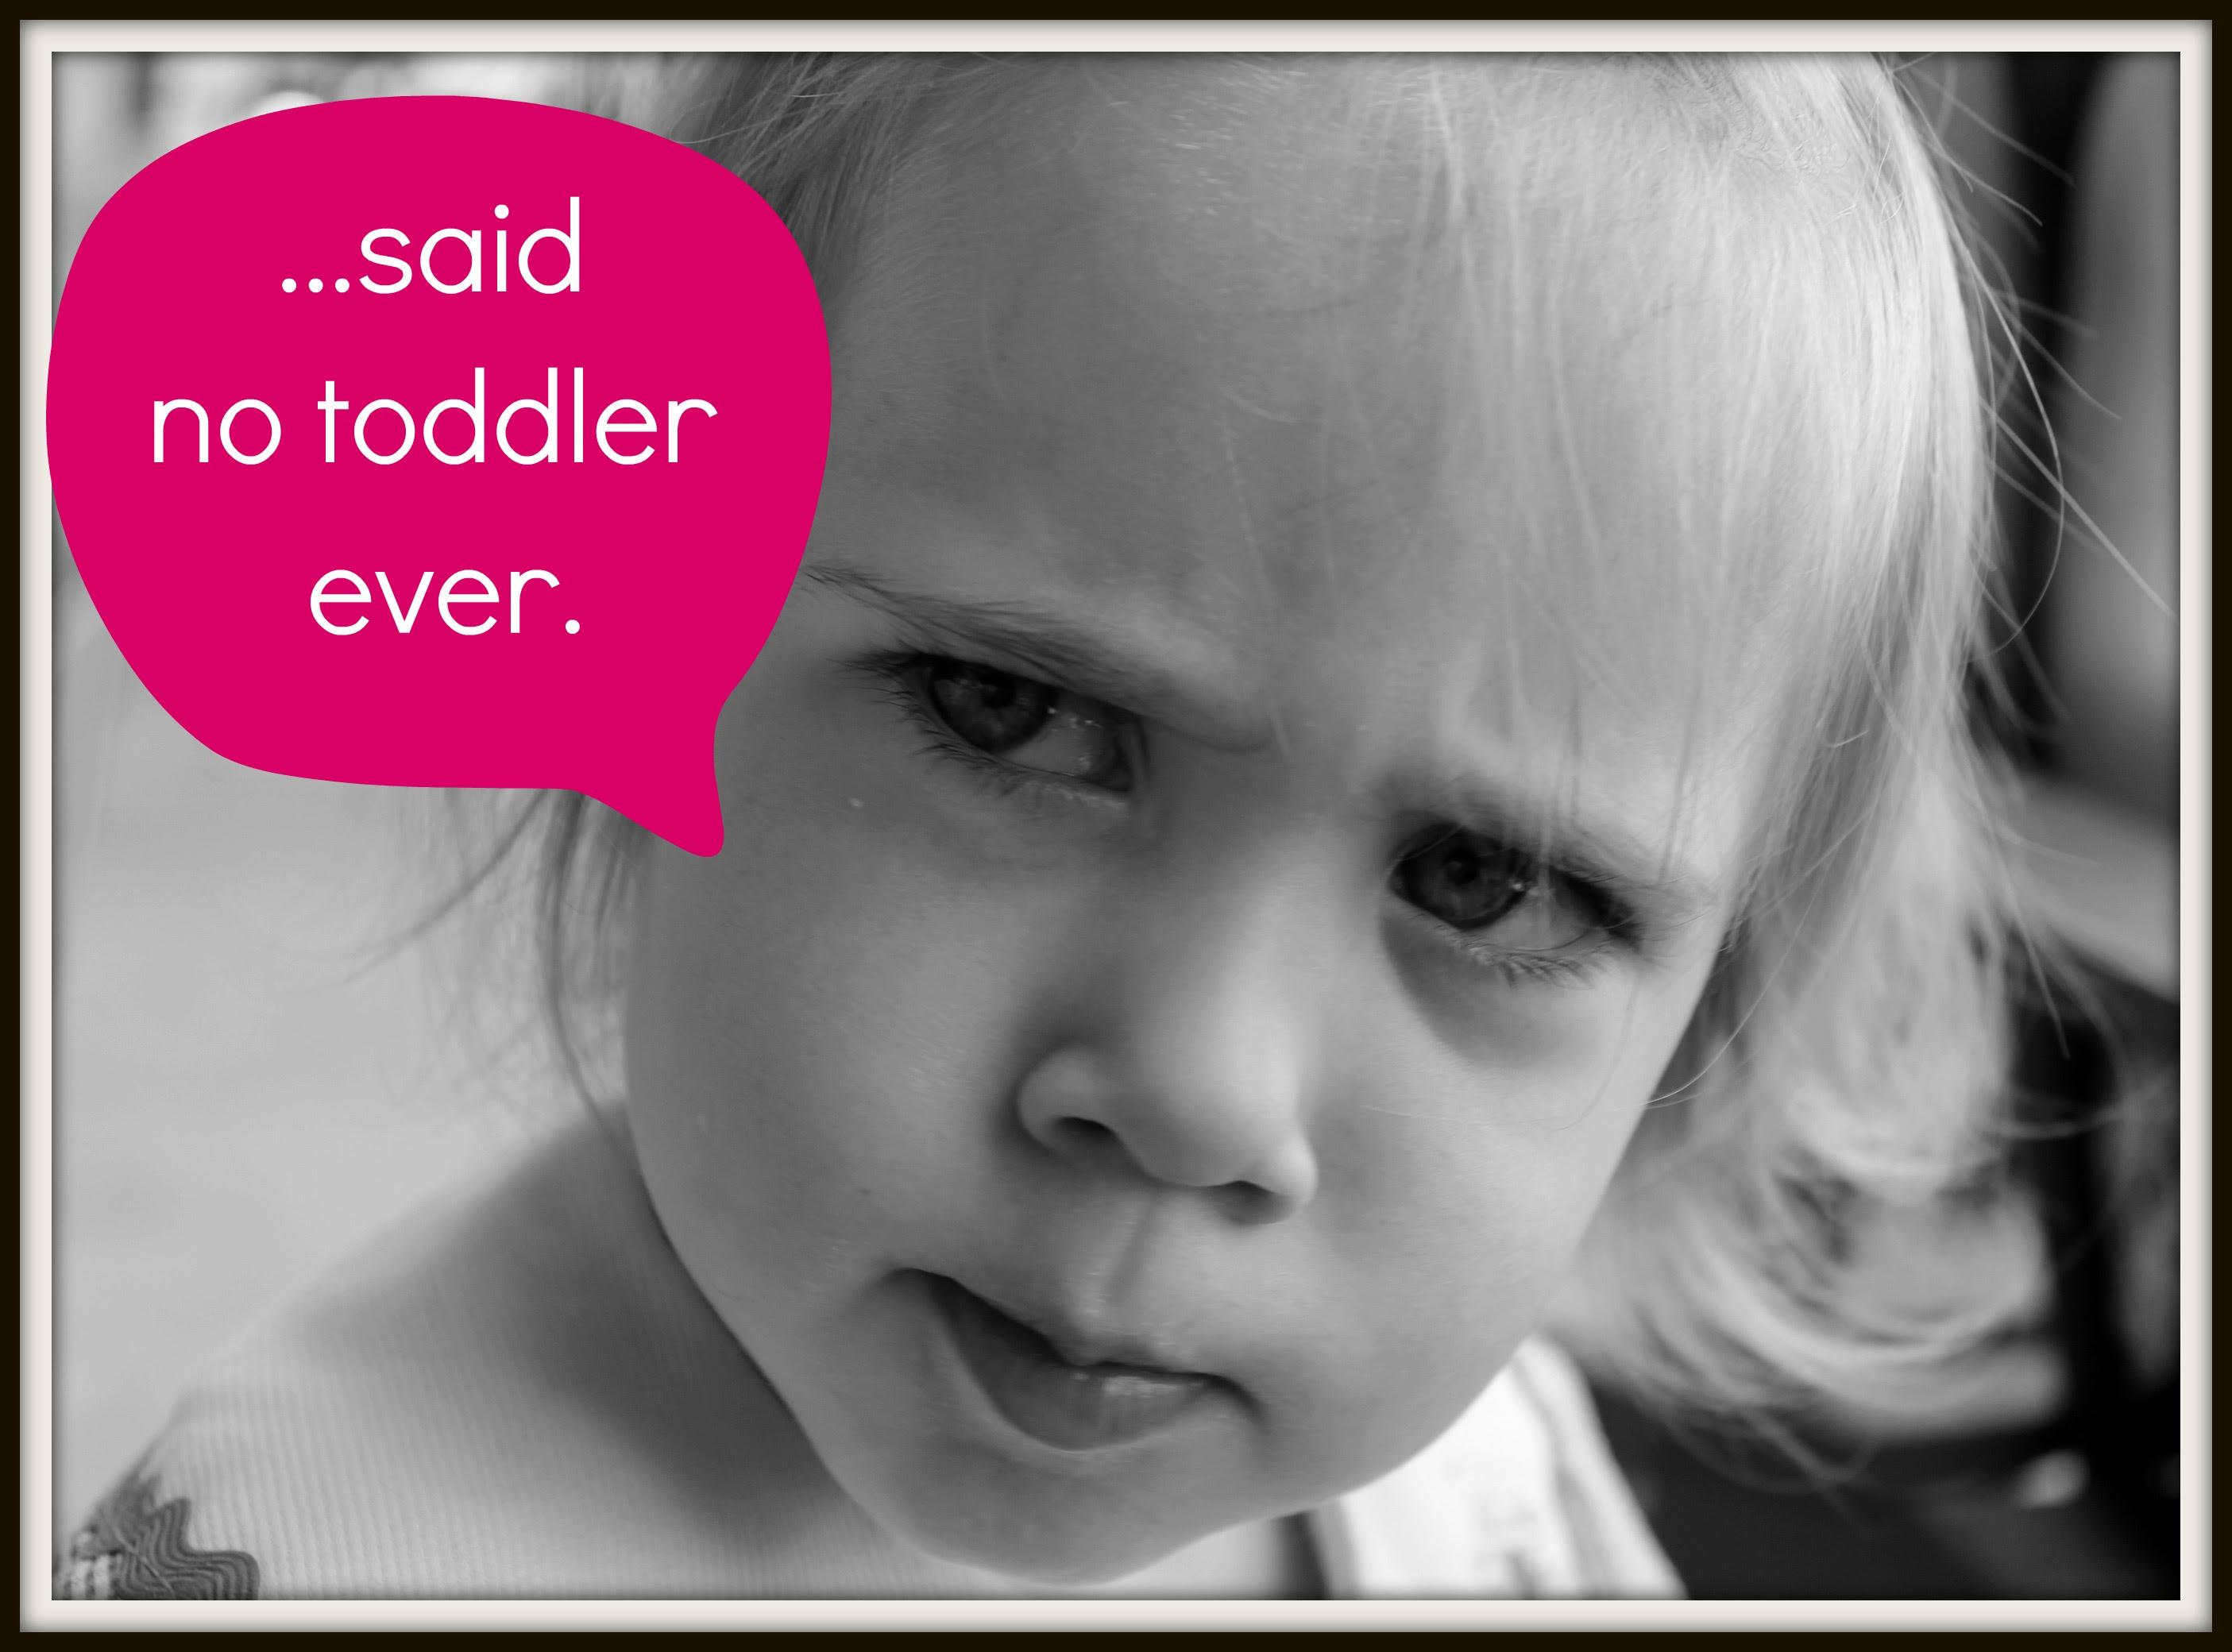 Funny Toddler Memes